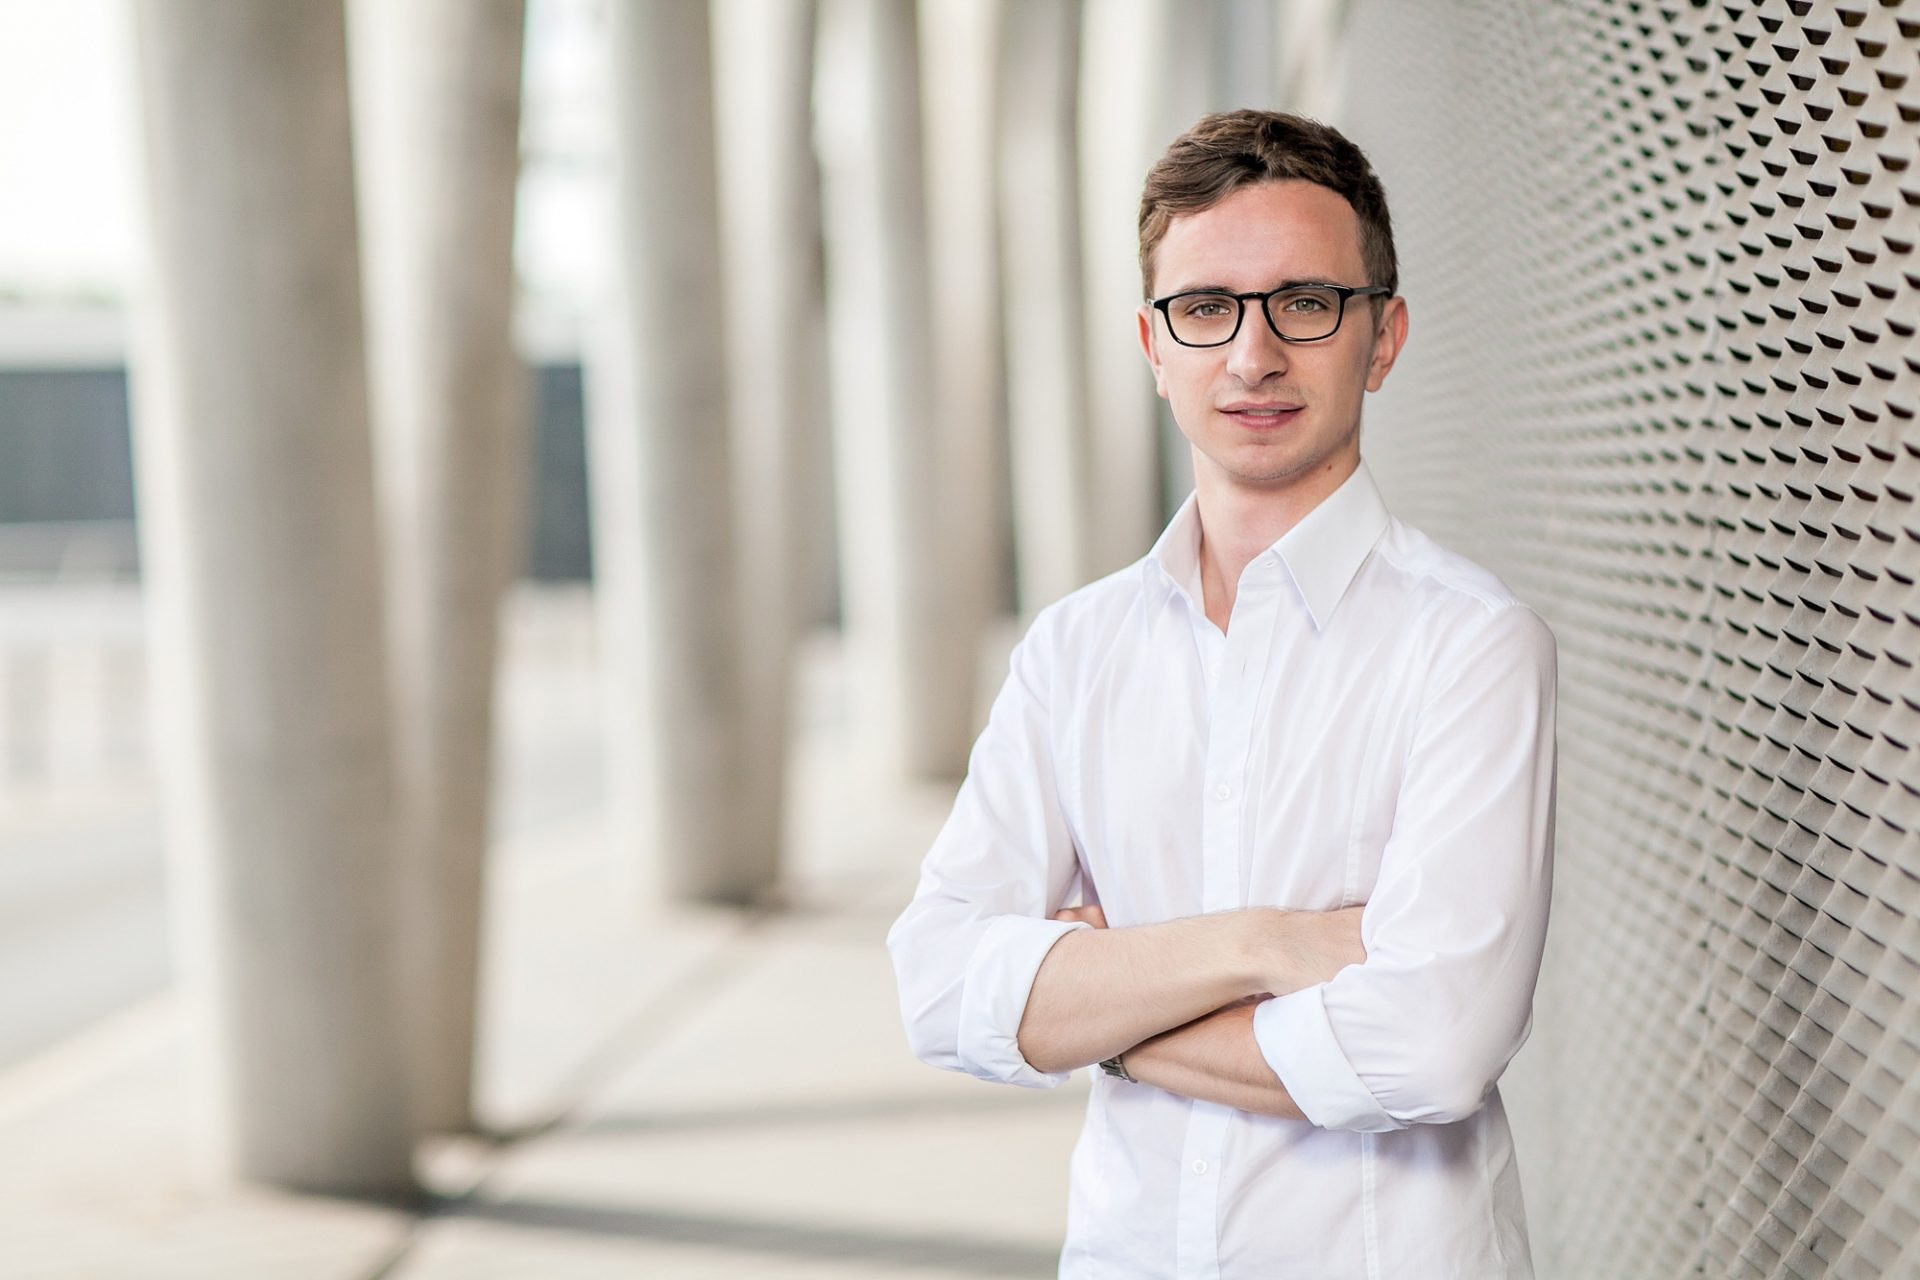 Portraitfotograf für Businessportraits in Frankfurt ©Offenblende / Nikita